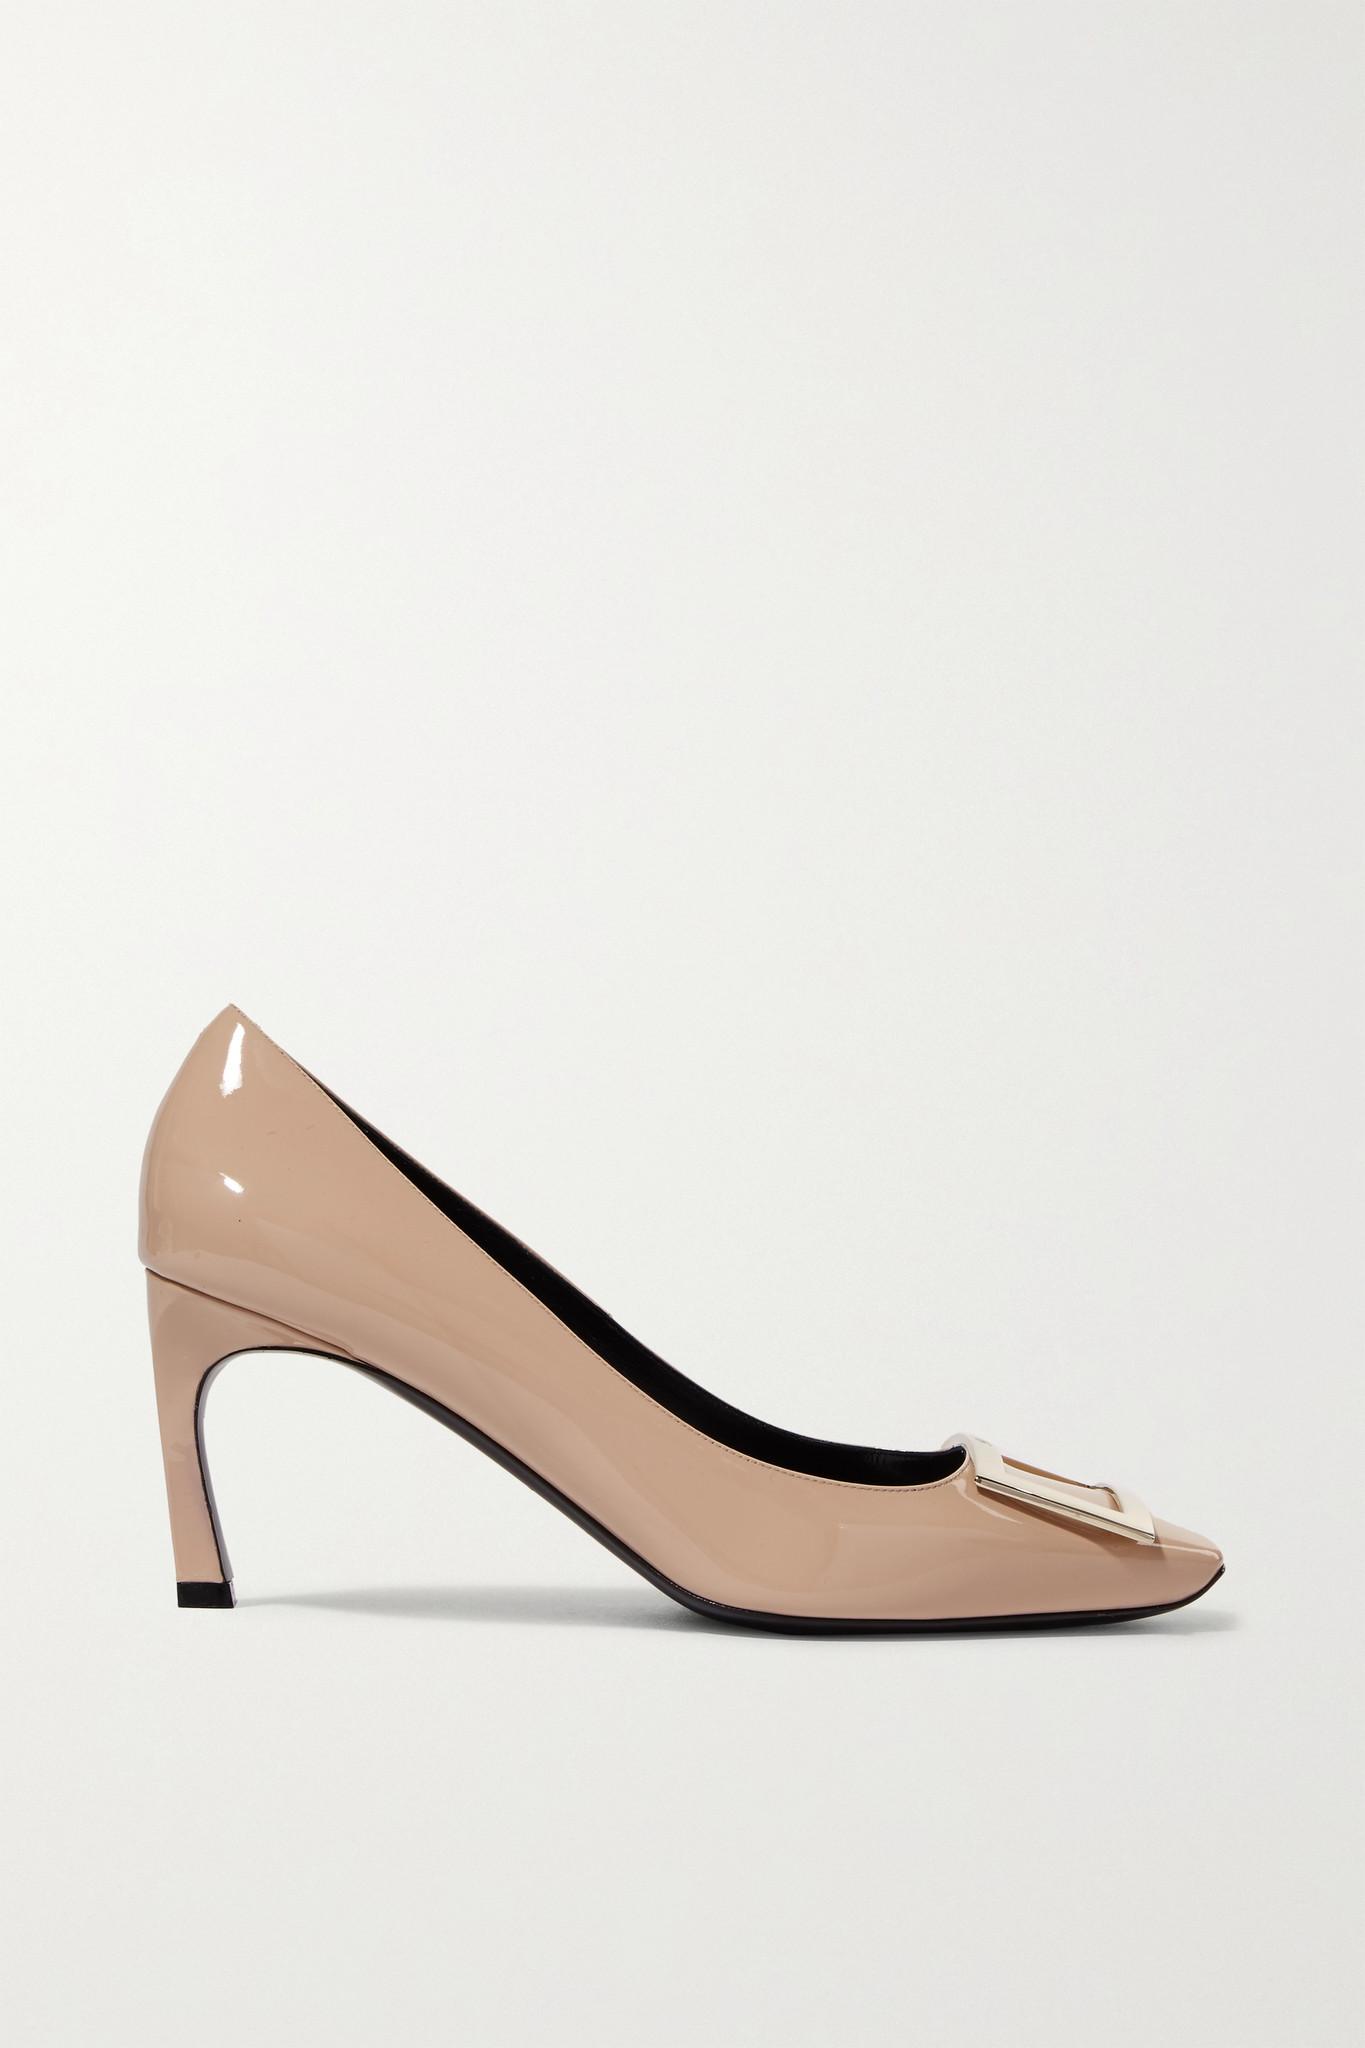 ROGER VIVIER - Belle Vivier Trompette 漆皮高跟鞋 - 中性色 - IT41